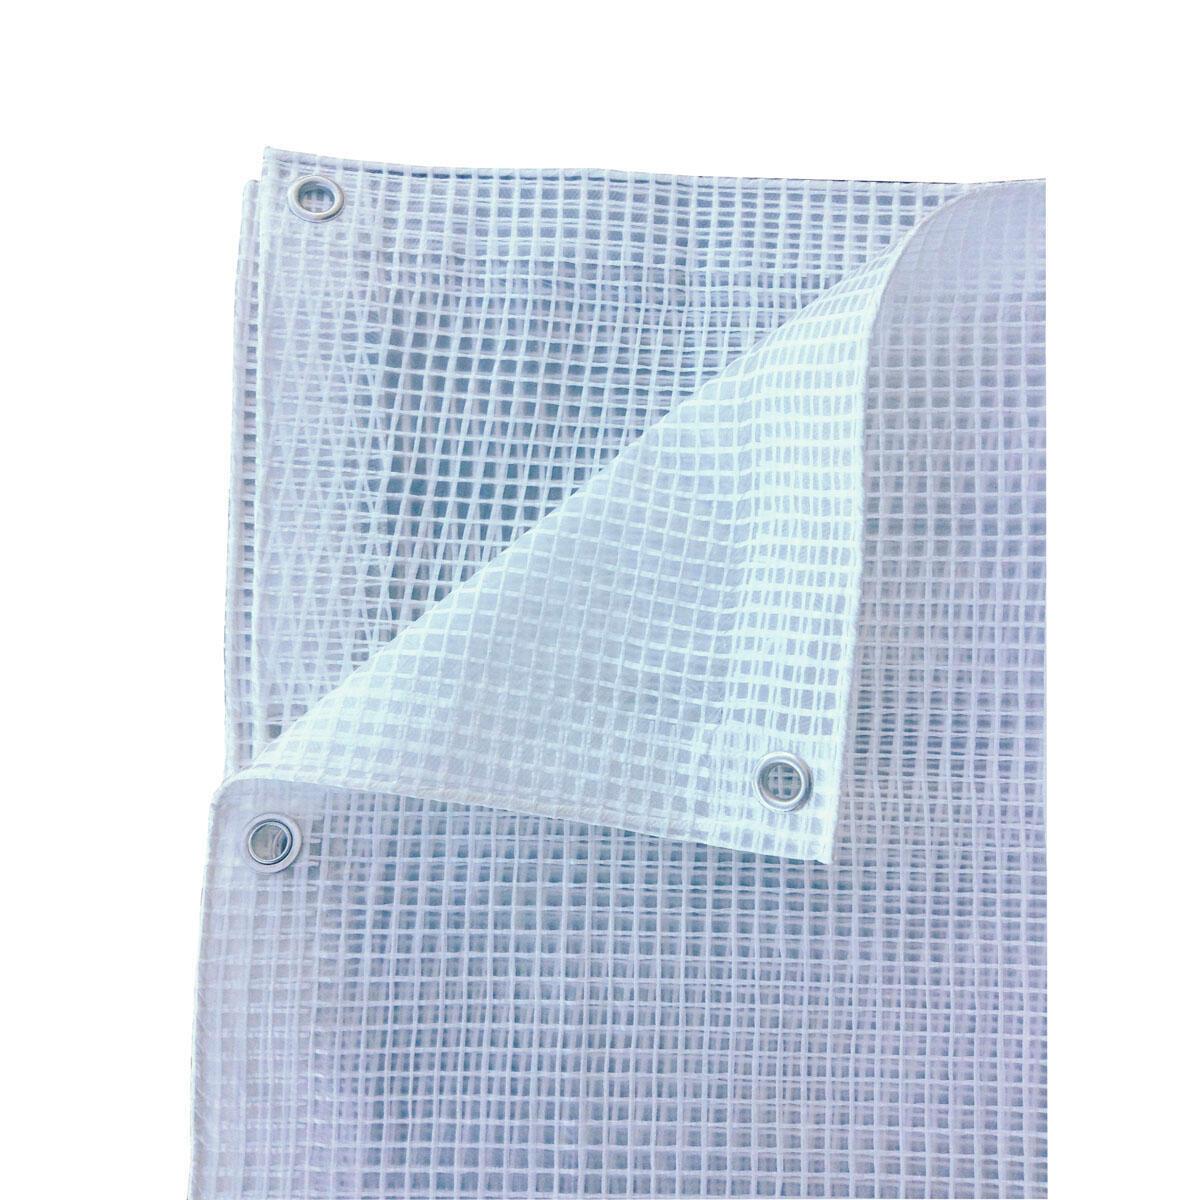 Telo per tenda da esterno trasparente 400 x 600 cm